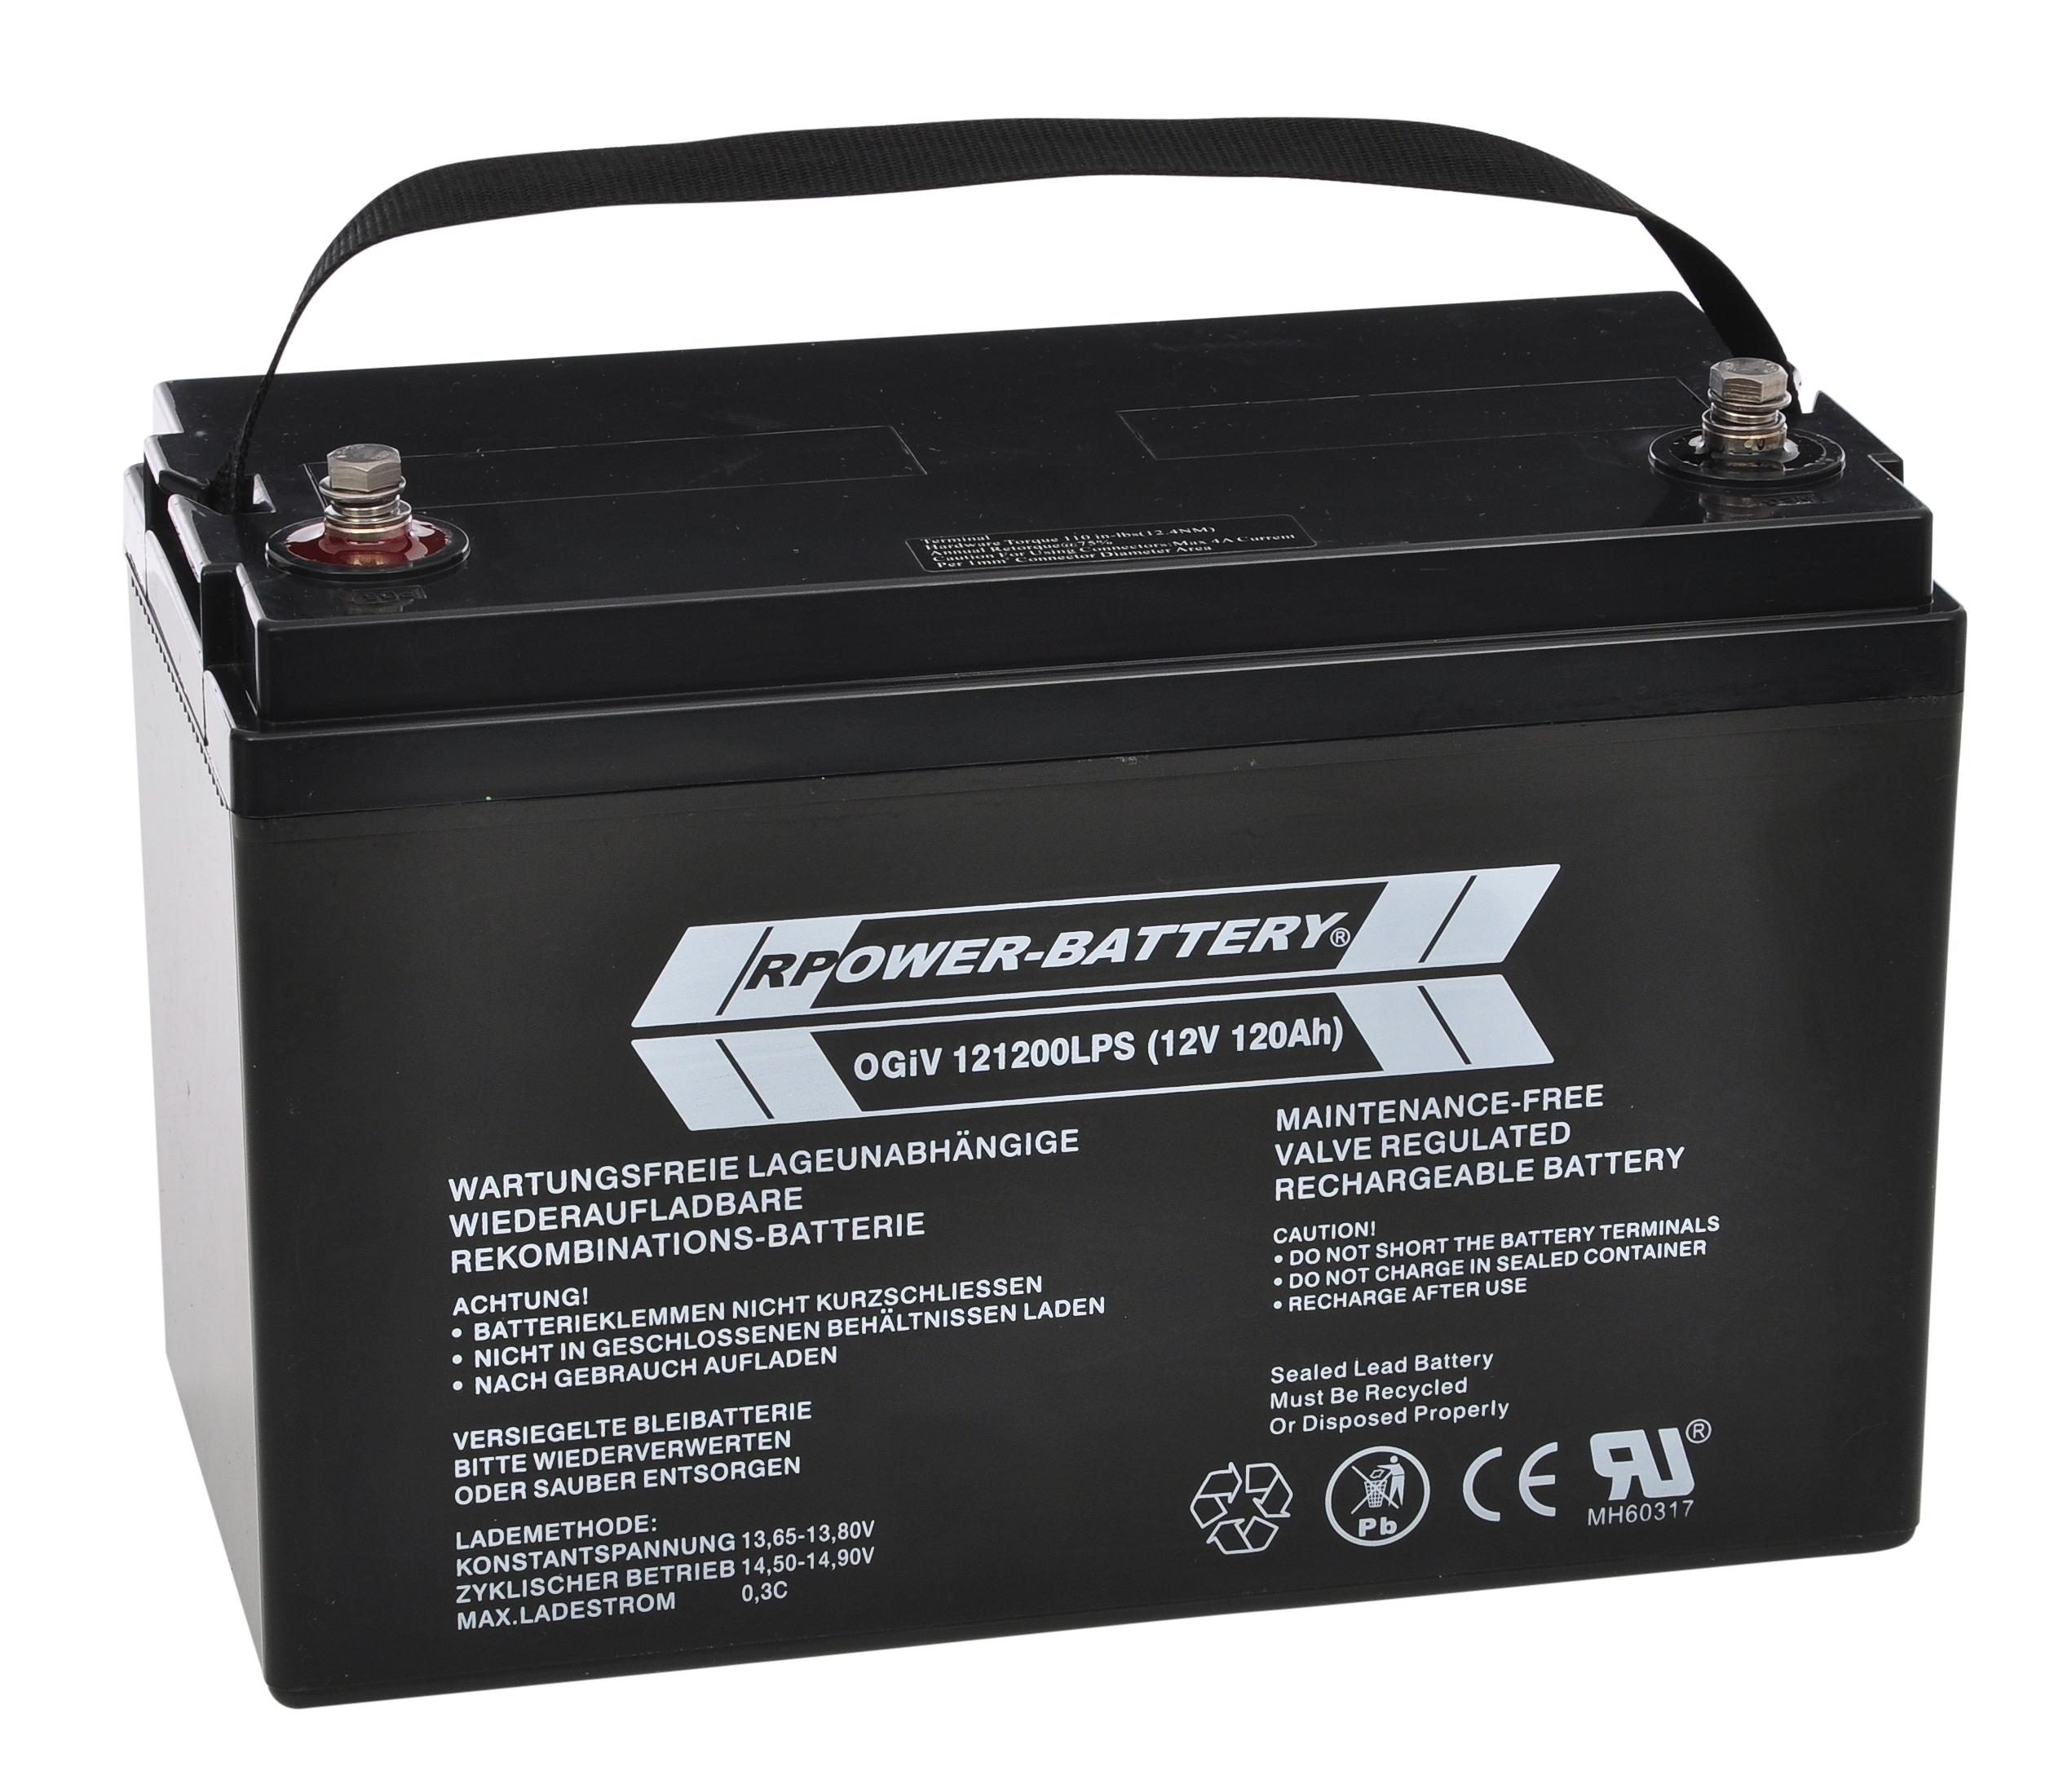 Batteriesatz 216V 18 Stk, longlife OGIV 12V/127Ah (C20)